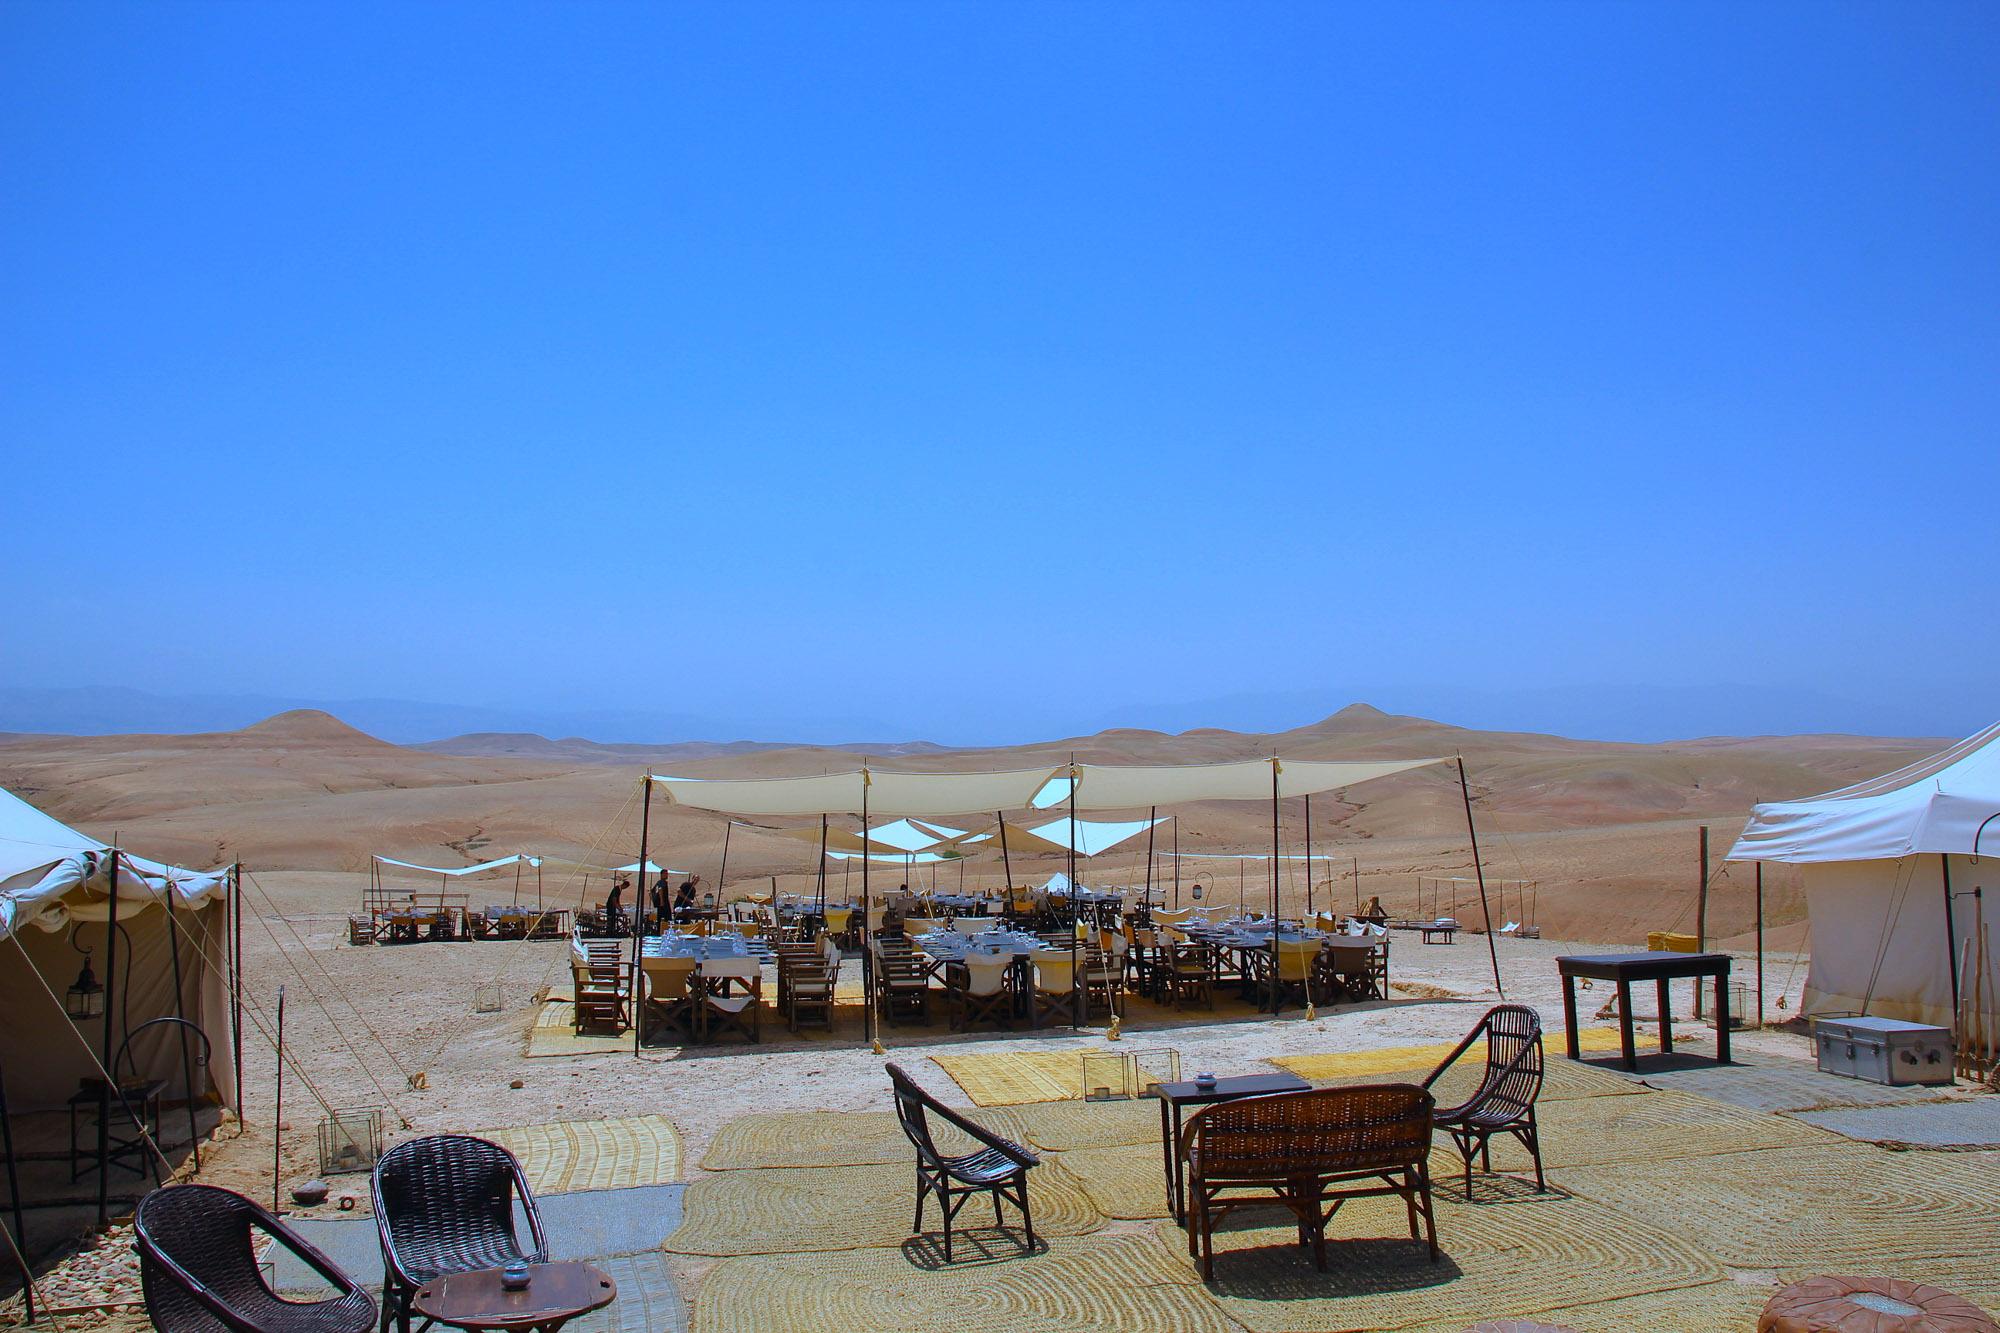 organisation de séminaire désert marrakech agafay maroc